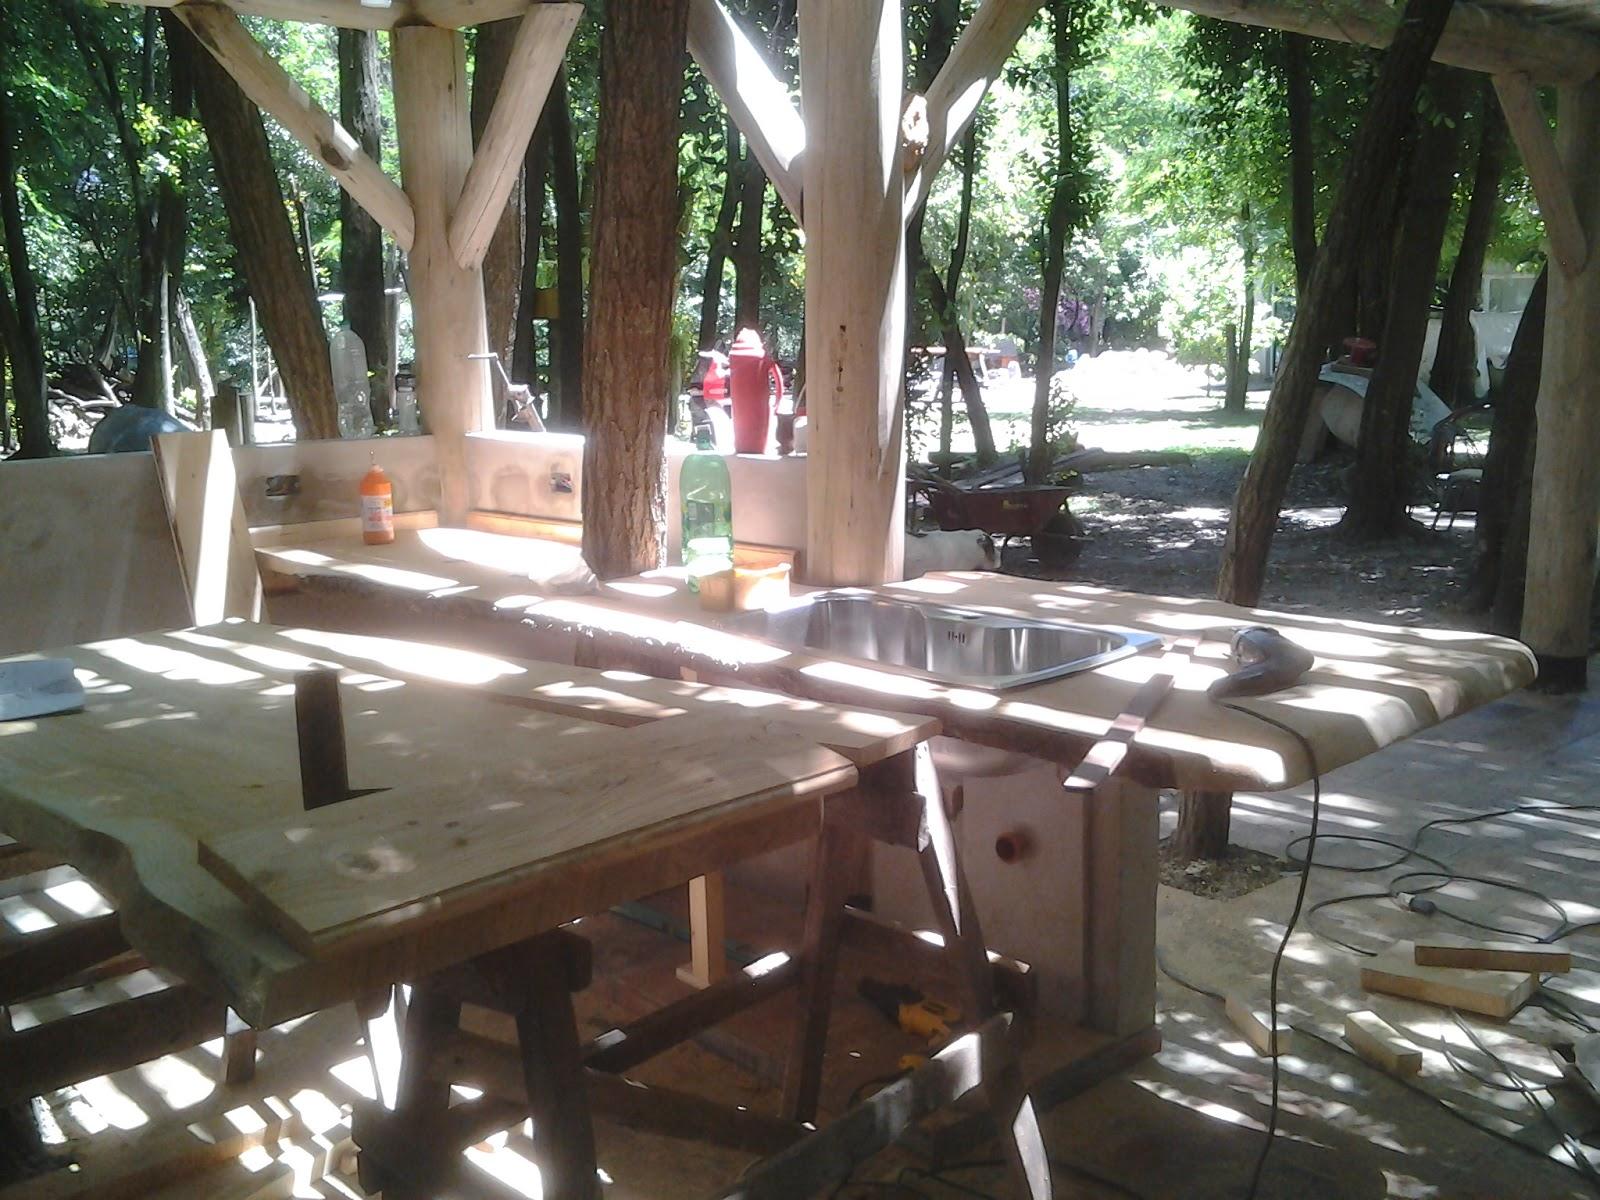 Muebles Parque Leloir - Quincho Maderera Los 2 Julios [mjhdah]http://2.bp.blogspot.com/-f-88BORDDc4/VdFrt-AF5yI/AAAAAAAABOE/14KPvknccL0/s1600/Foto0518.jpg